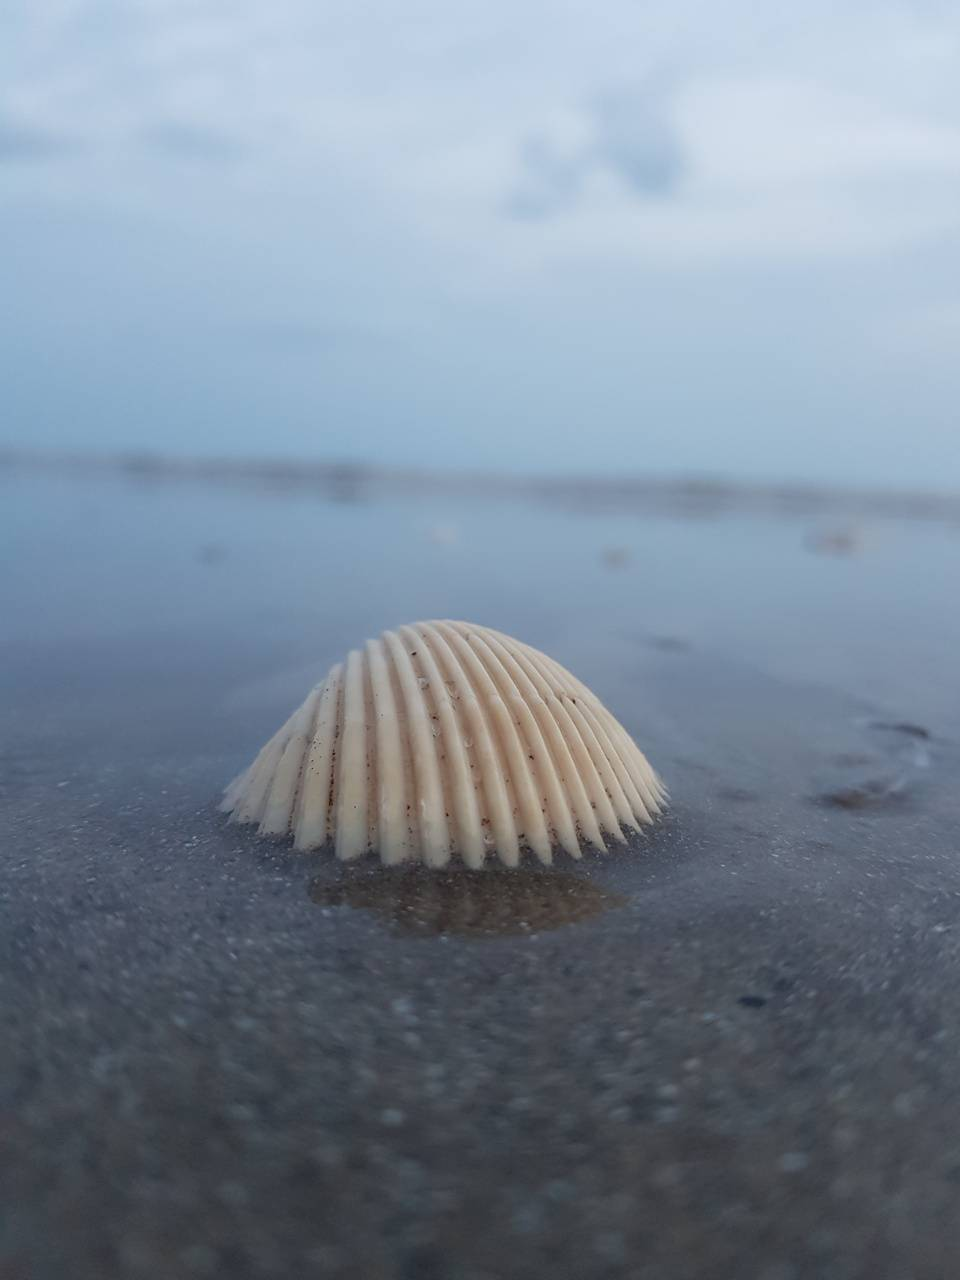 Sea gills